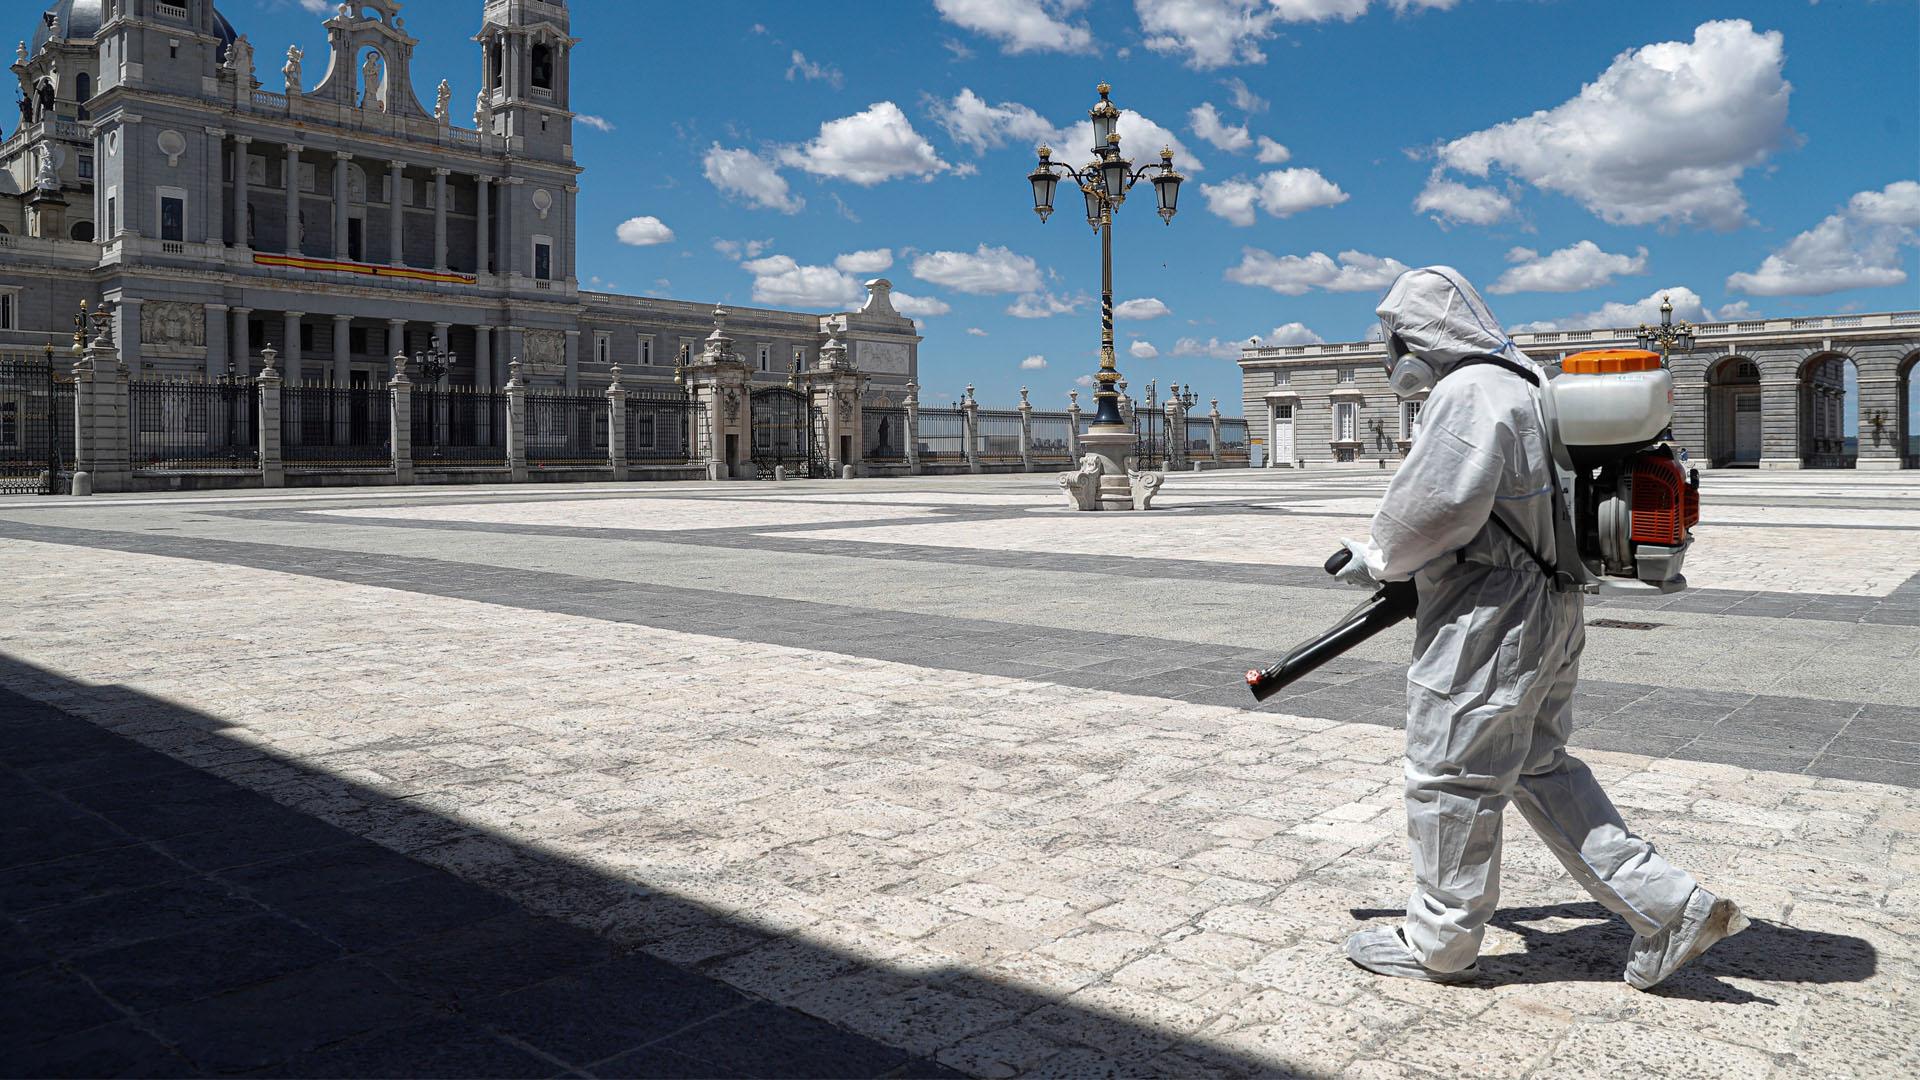 España aplicará un plan especial de prevención hasta derrotar al coronavirus